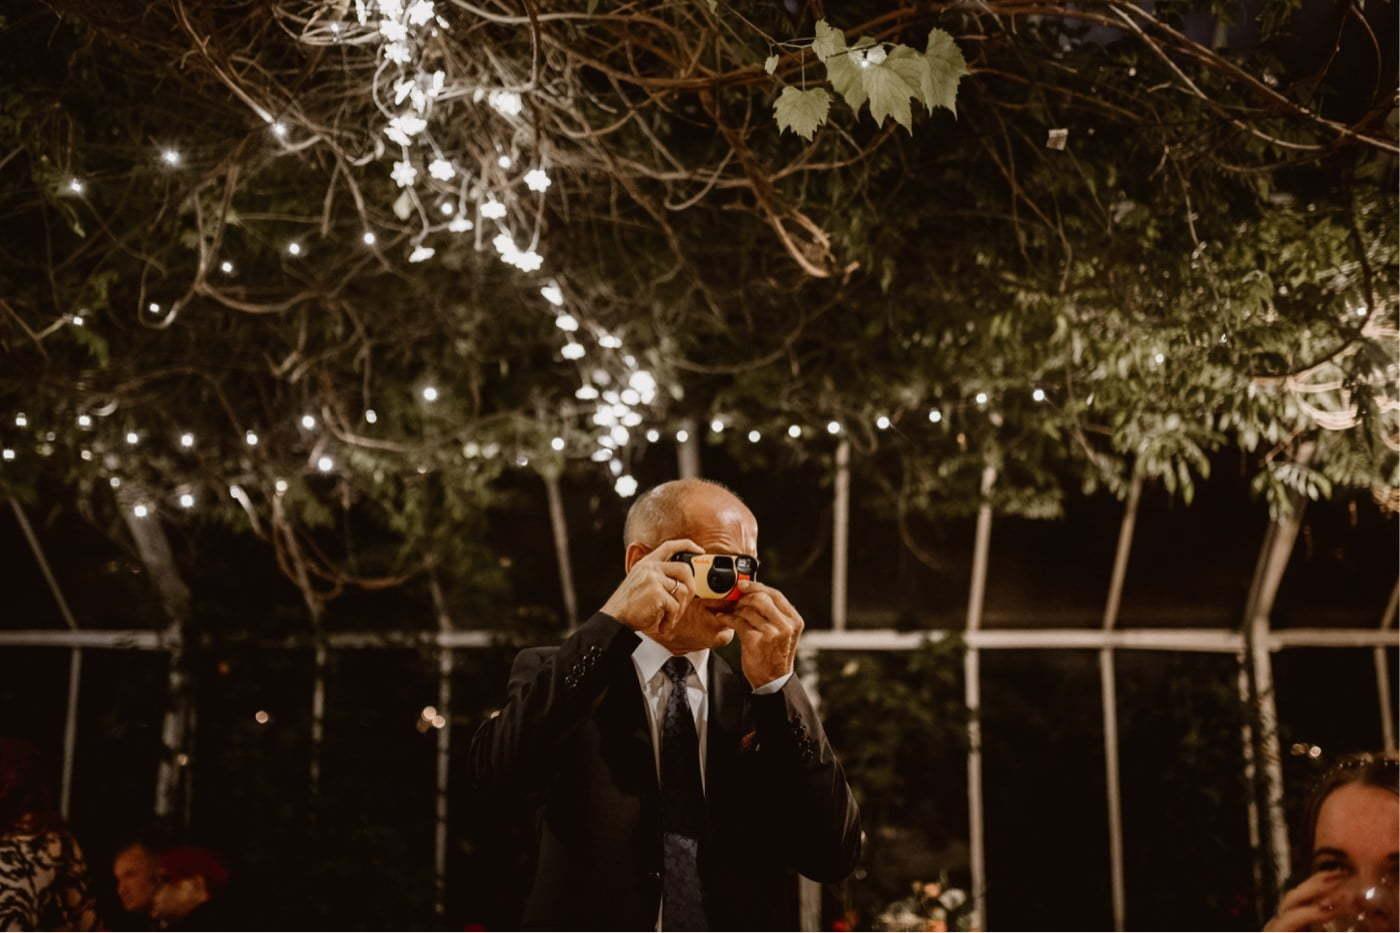 ewelina zieba rustykalne wesele stara oranzeria warszawa 075